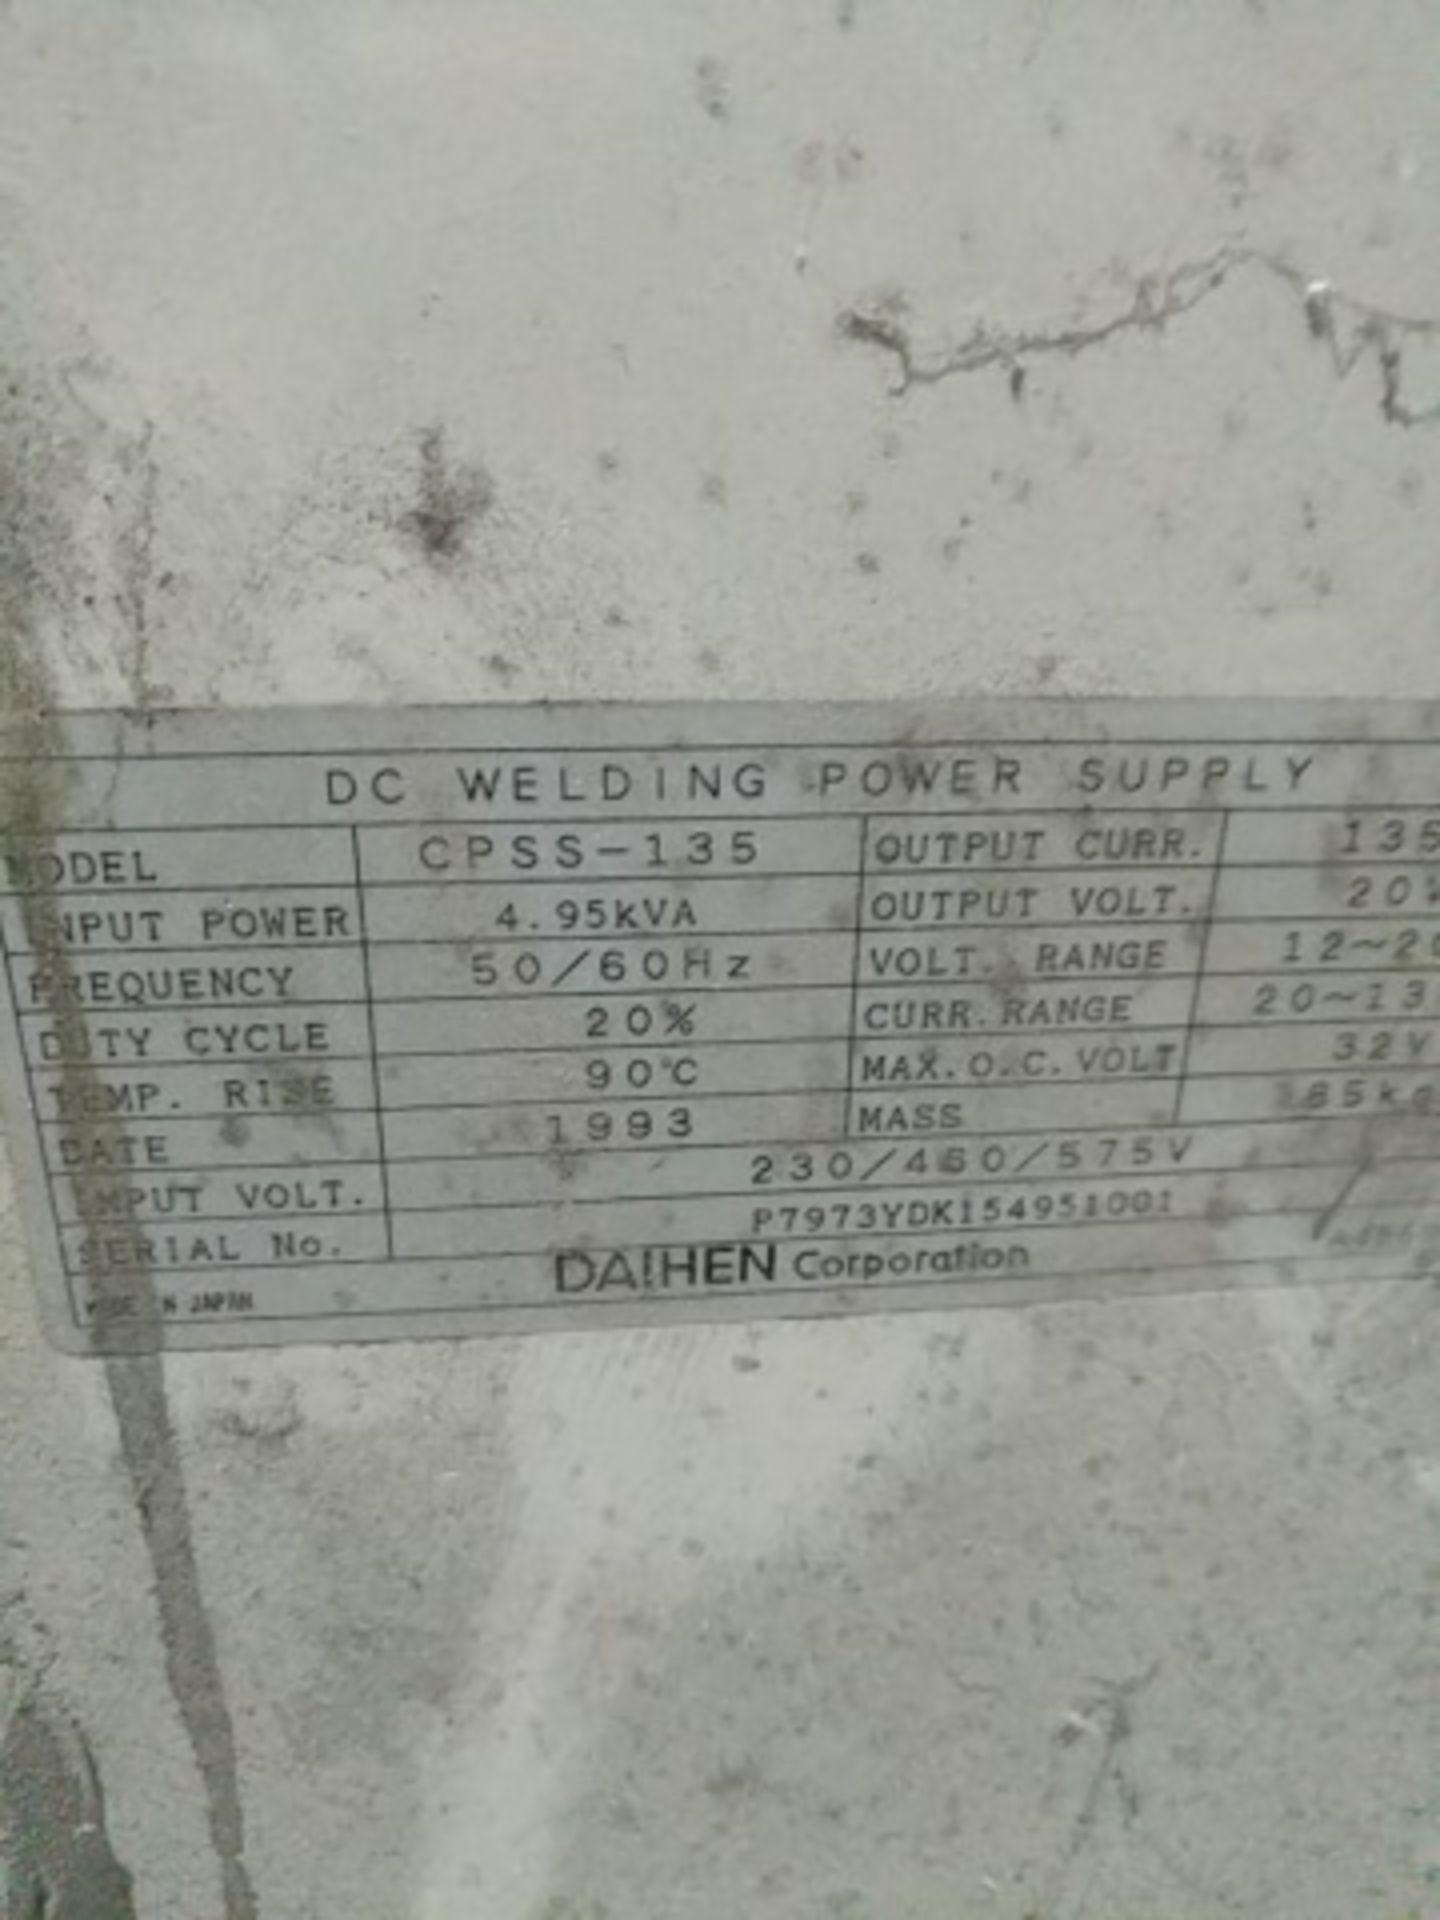 Daihen OTC Mig135 model CPSS-135 DC Power Source - Image 3 of 3